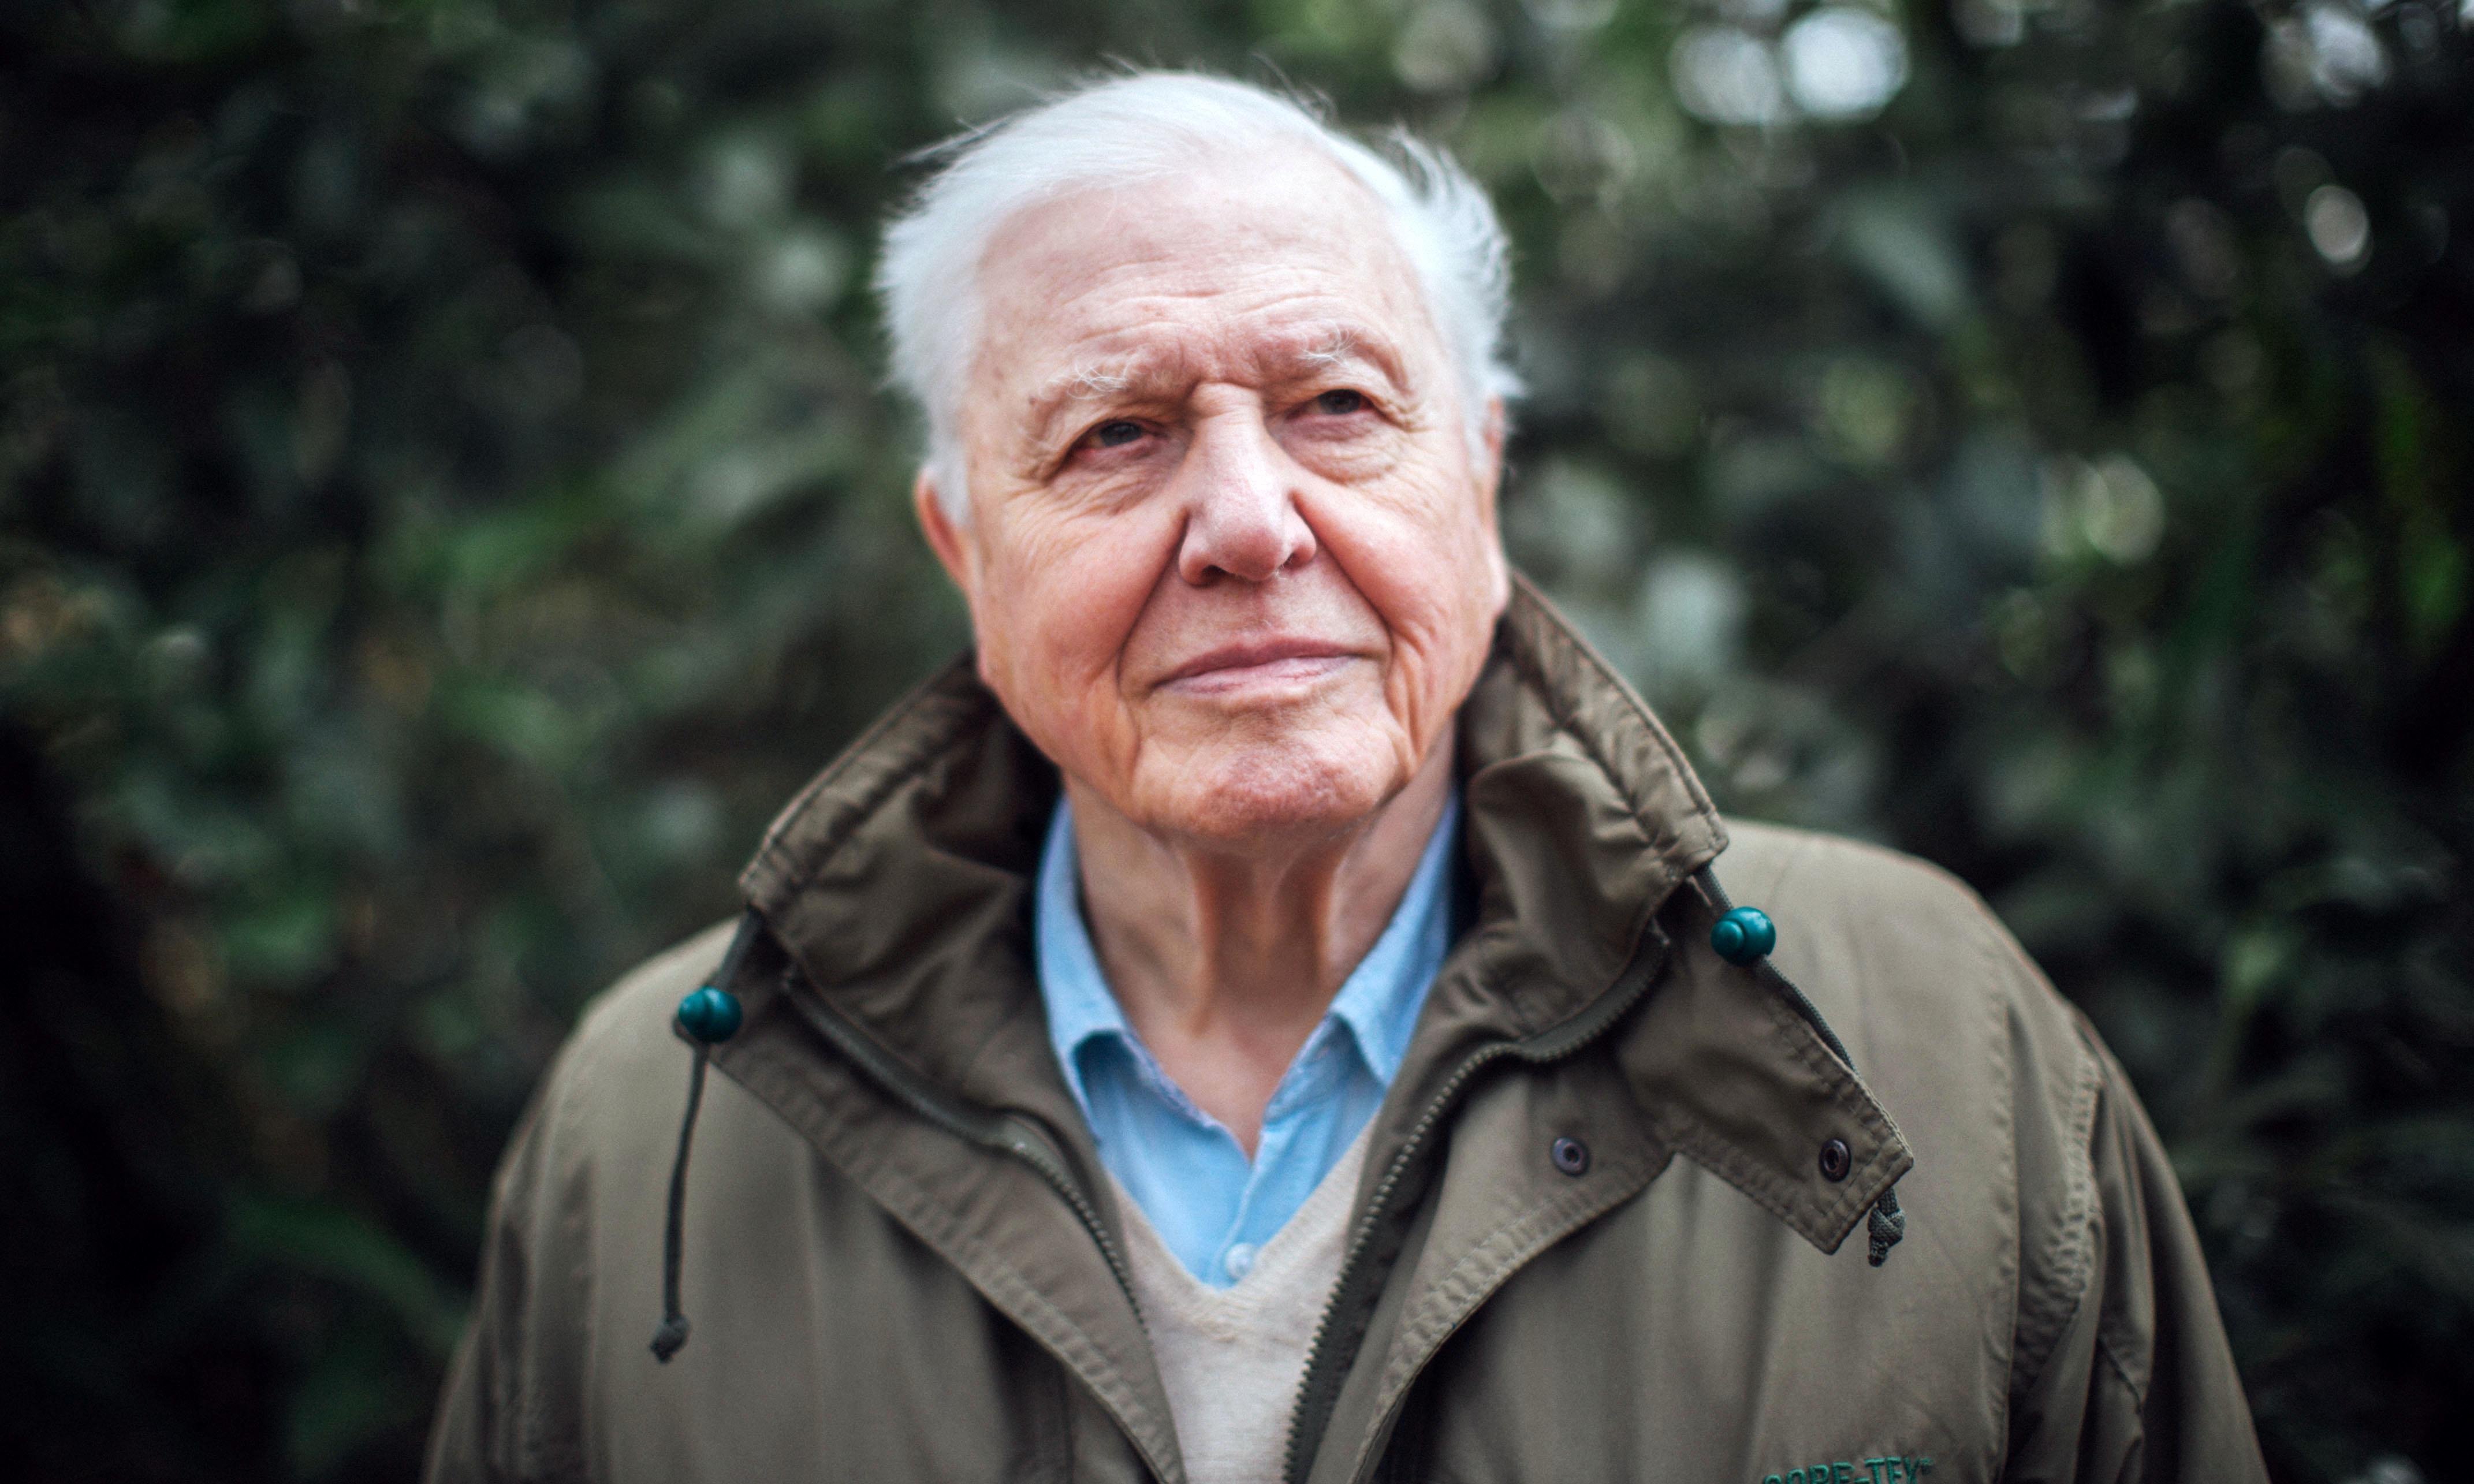 TV tonight: can David Attenborough save the planet?